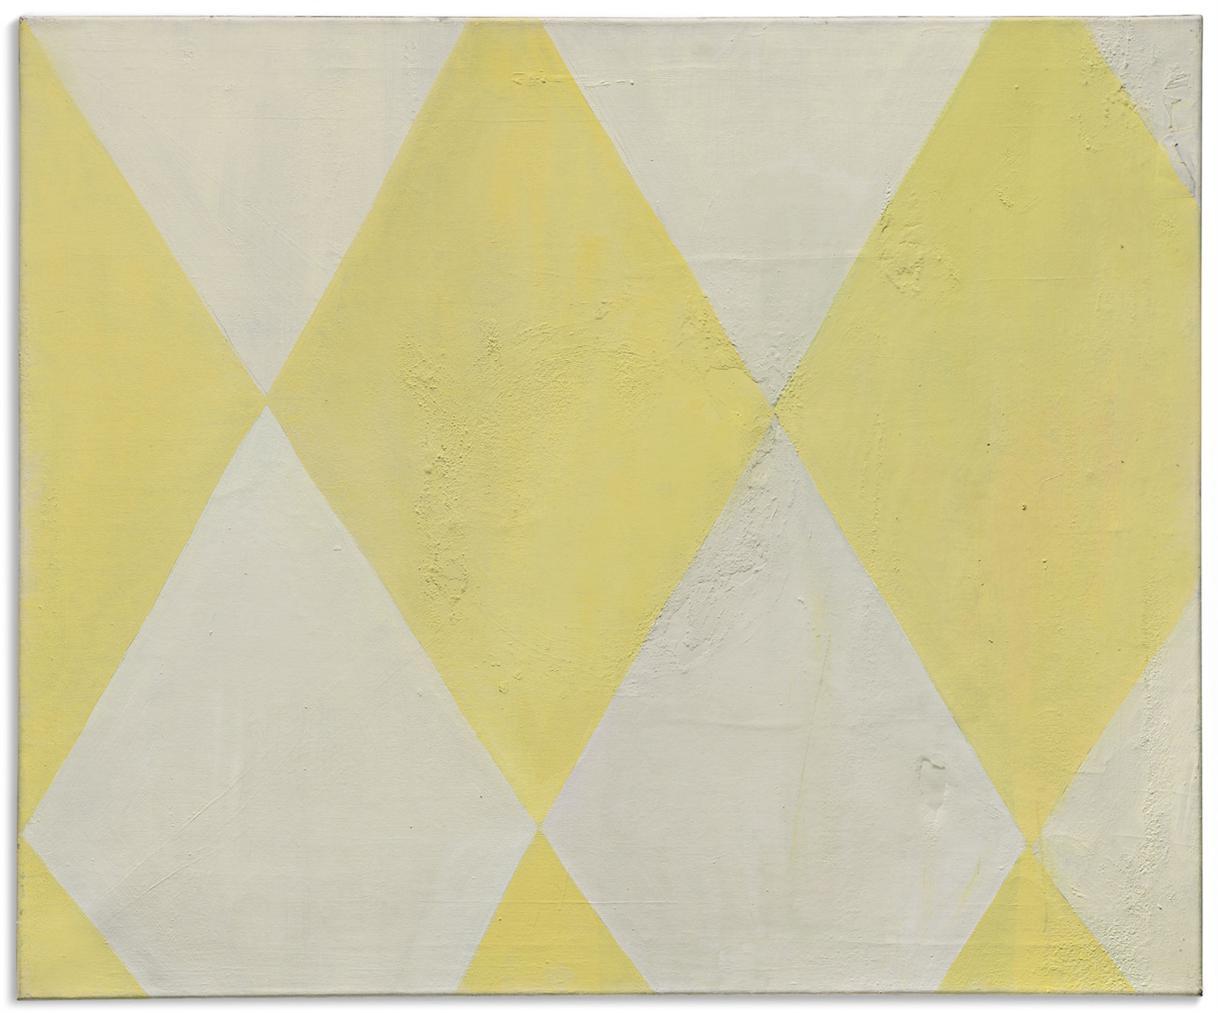 Luc Tuymans-Yellow-1986